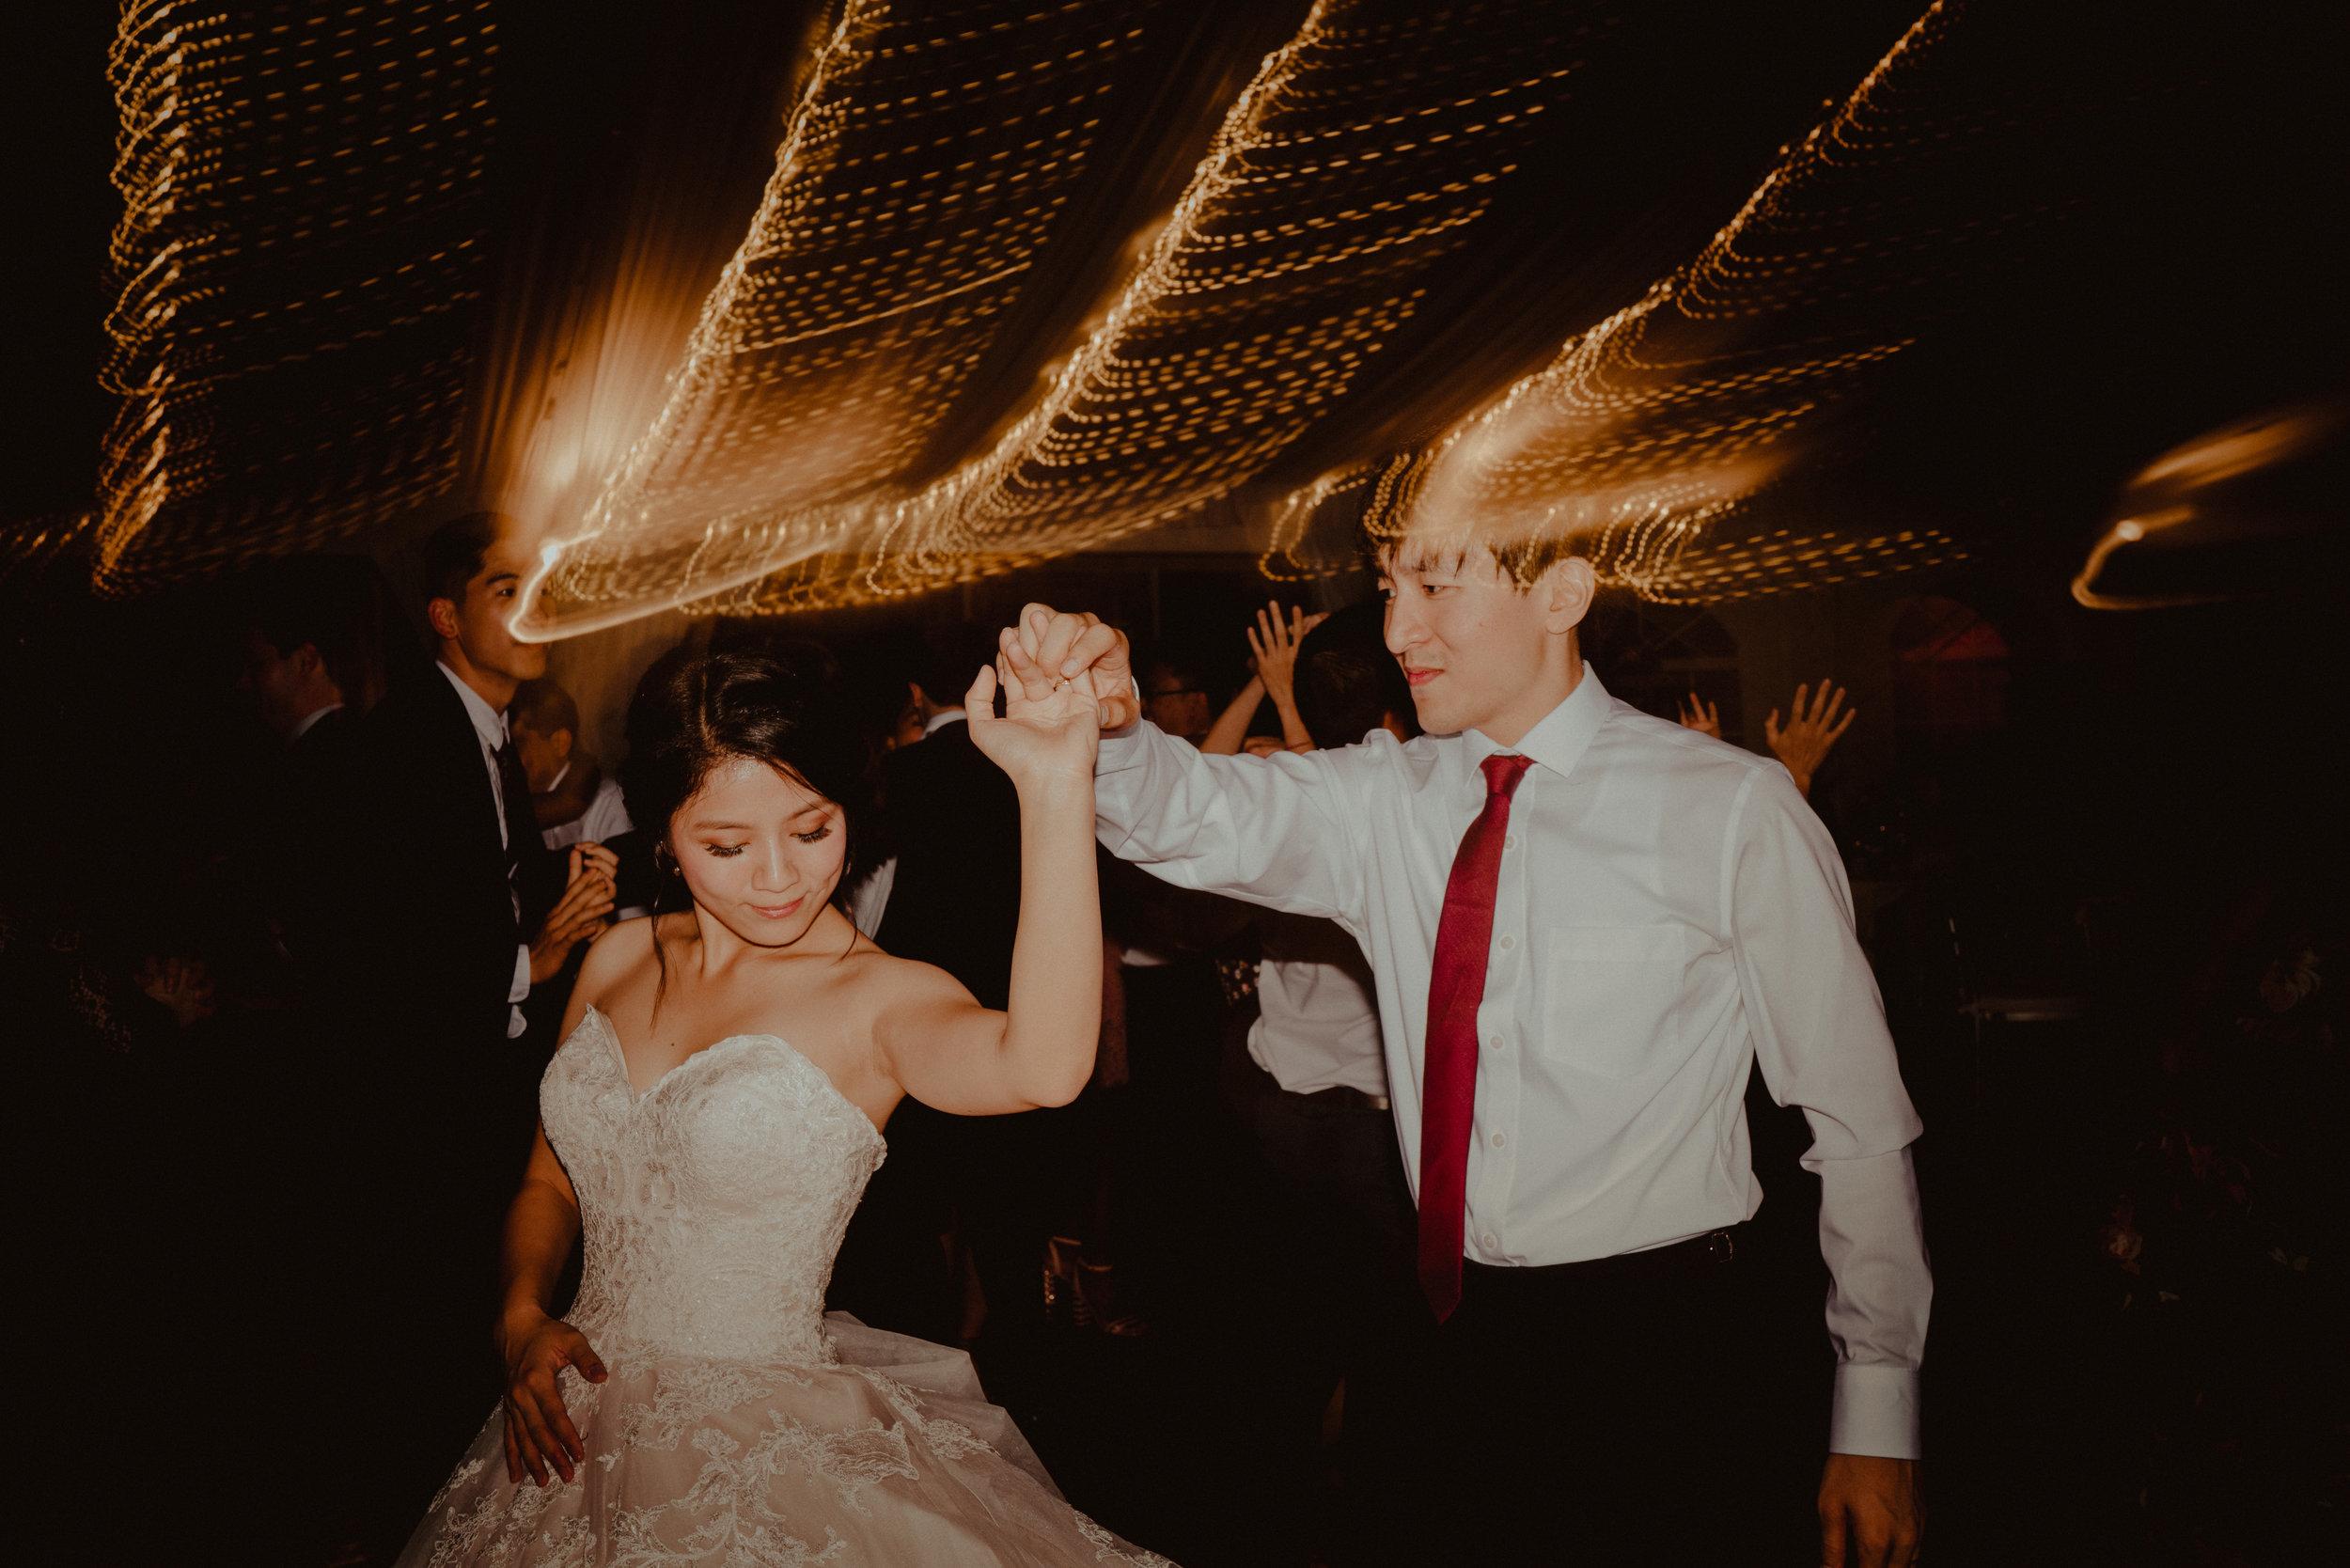 Irene-and-Jae-2019_Brooklyn_Wedding_Photographer_Chellise_Michael_Photography--159.jpg